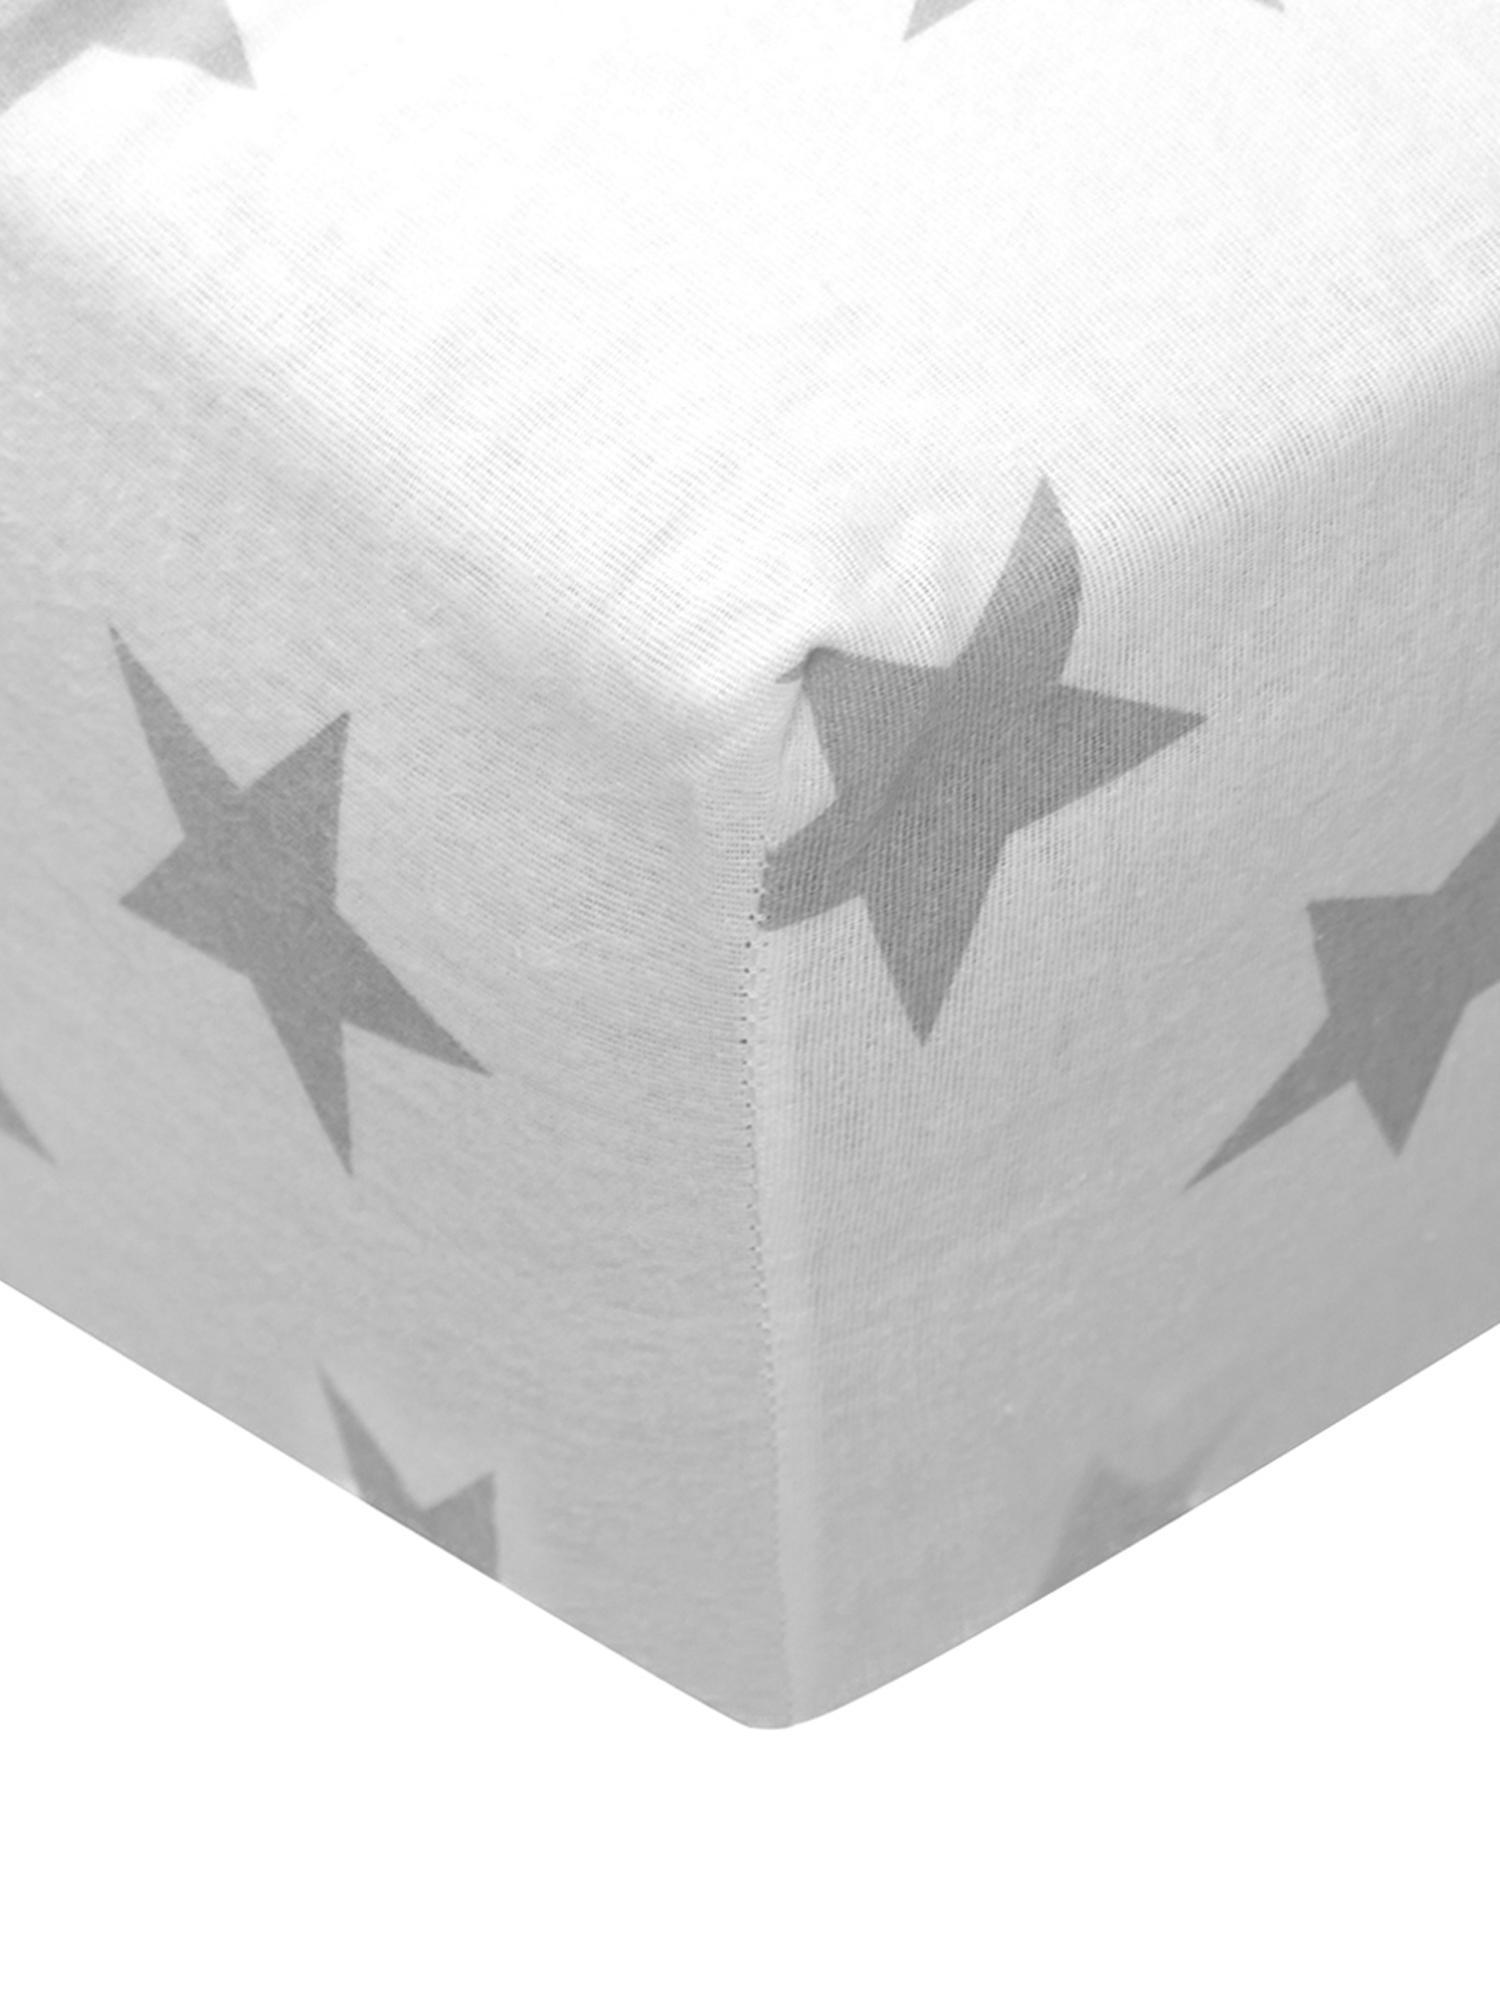 Sábana bajera de franela Alice, 100%algodón, franela, Gris, blanco, Cama 90 cm (90 x 200 cm)